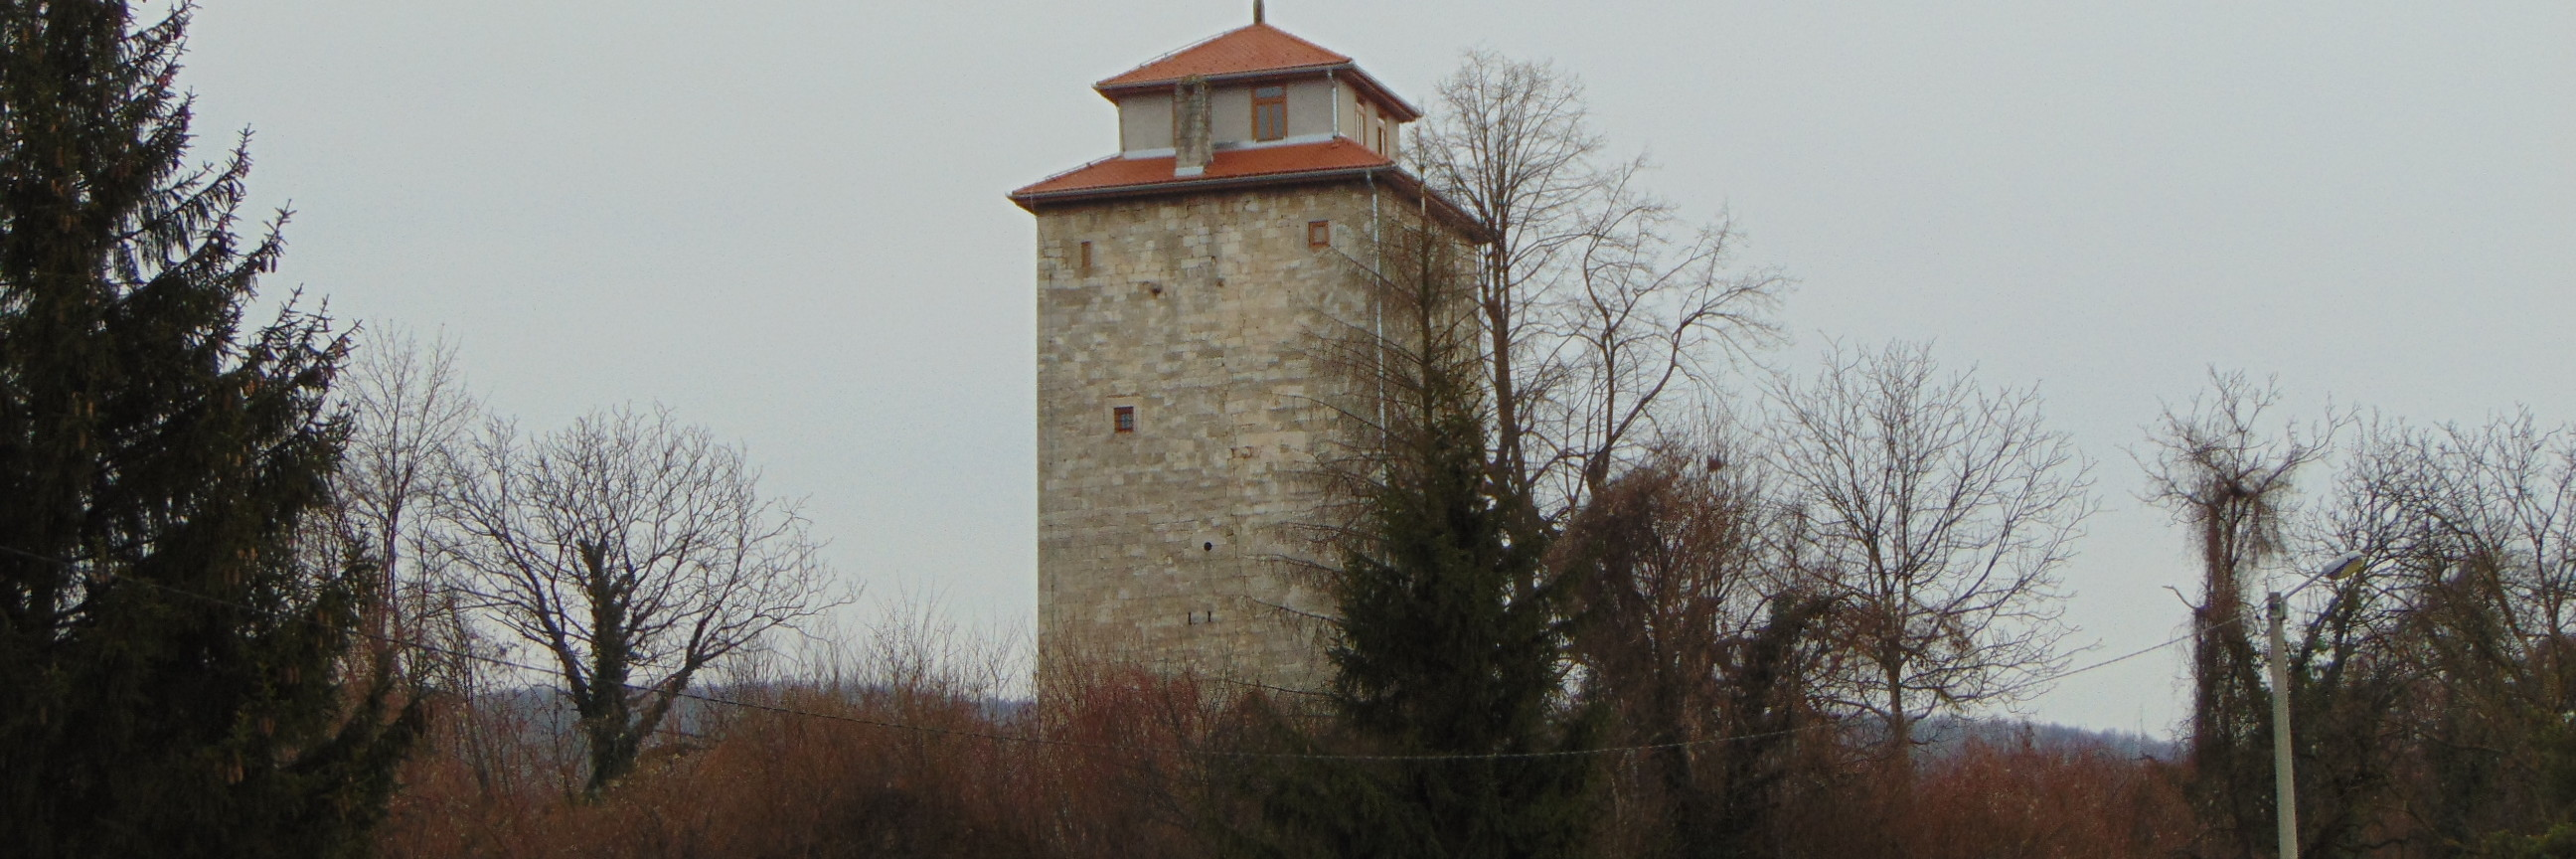 Башня Градашчевича. Фото: Елена Арсениевич, CC BY-SA 3.0